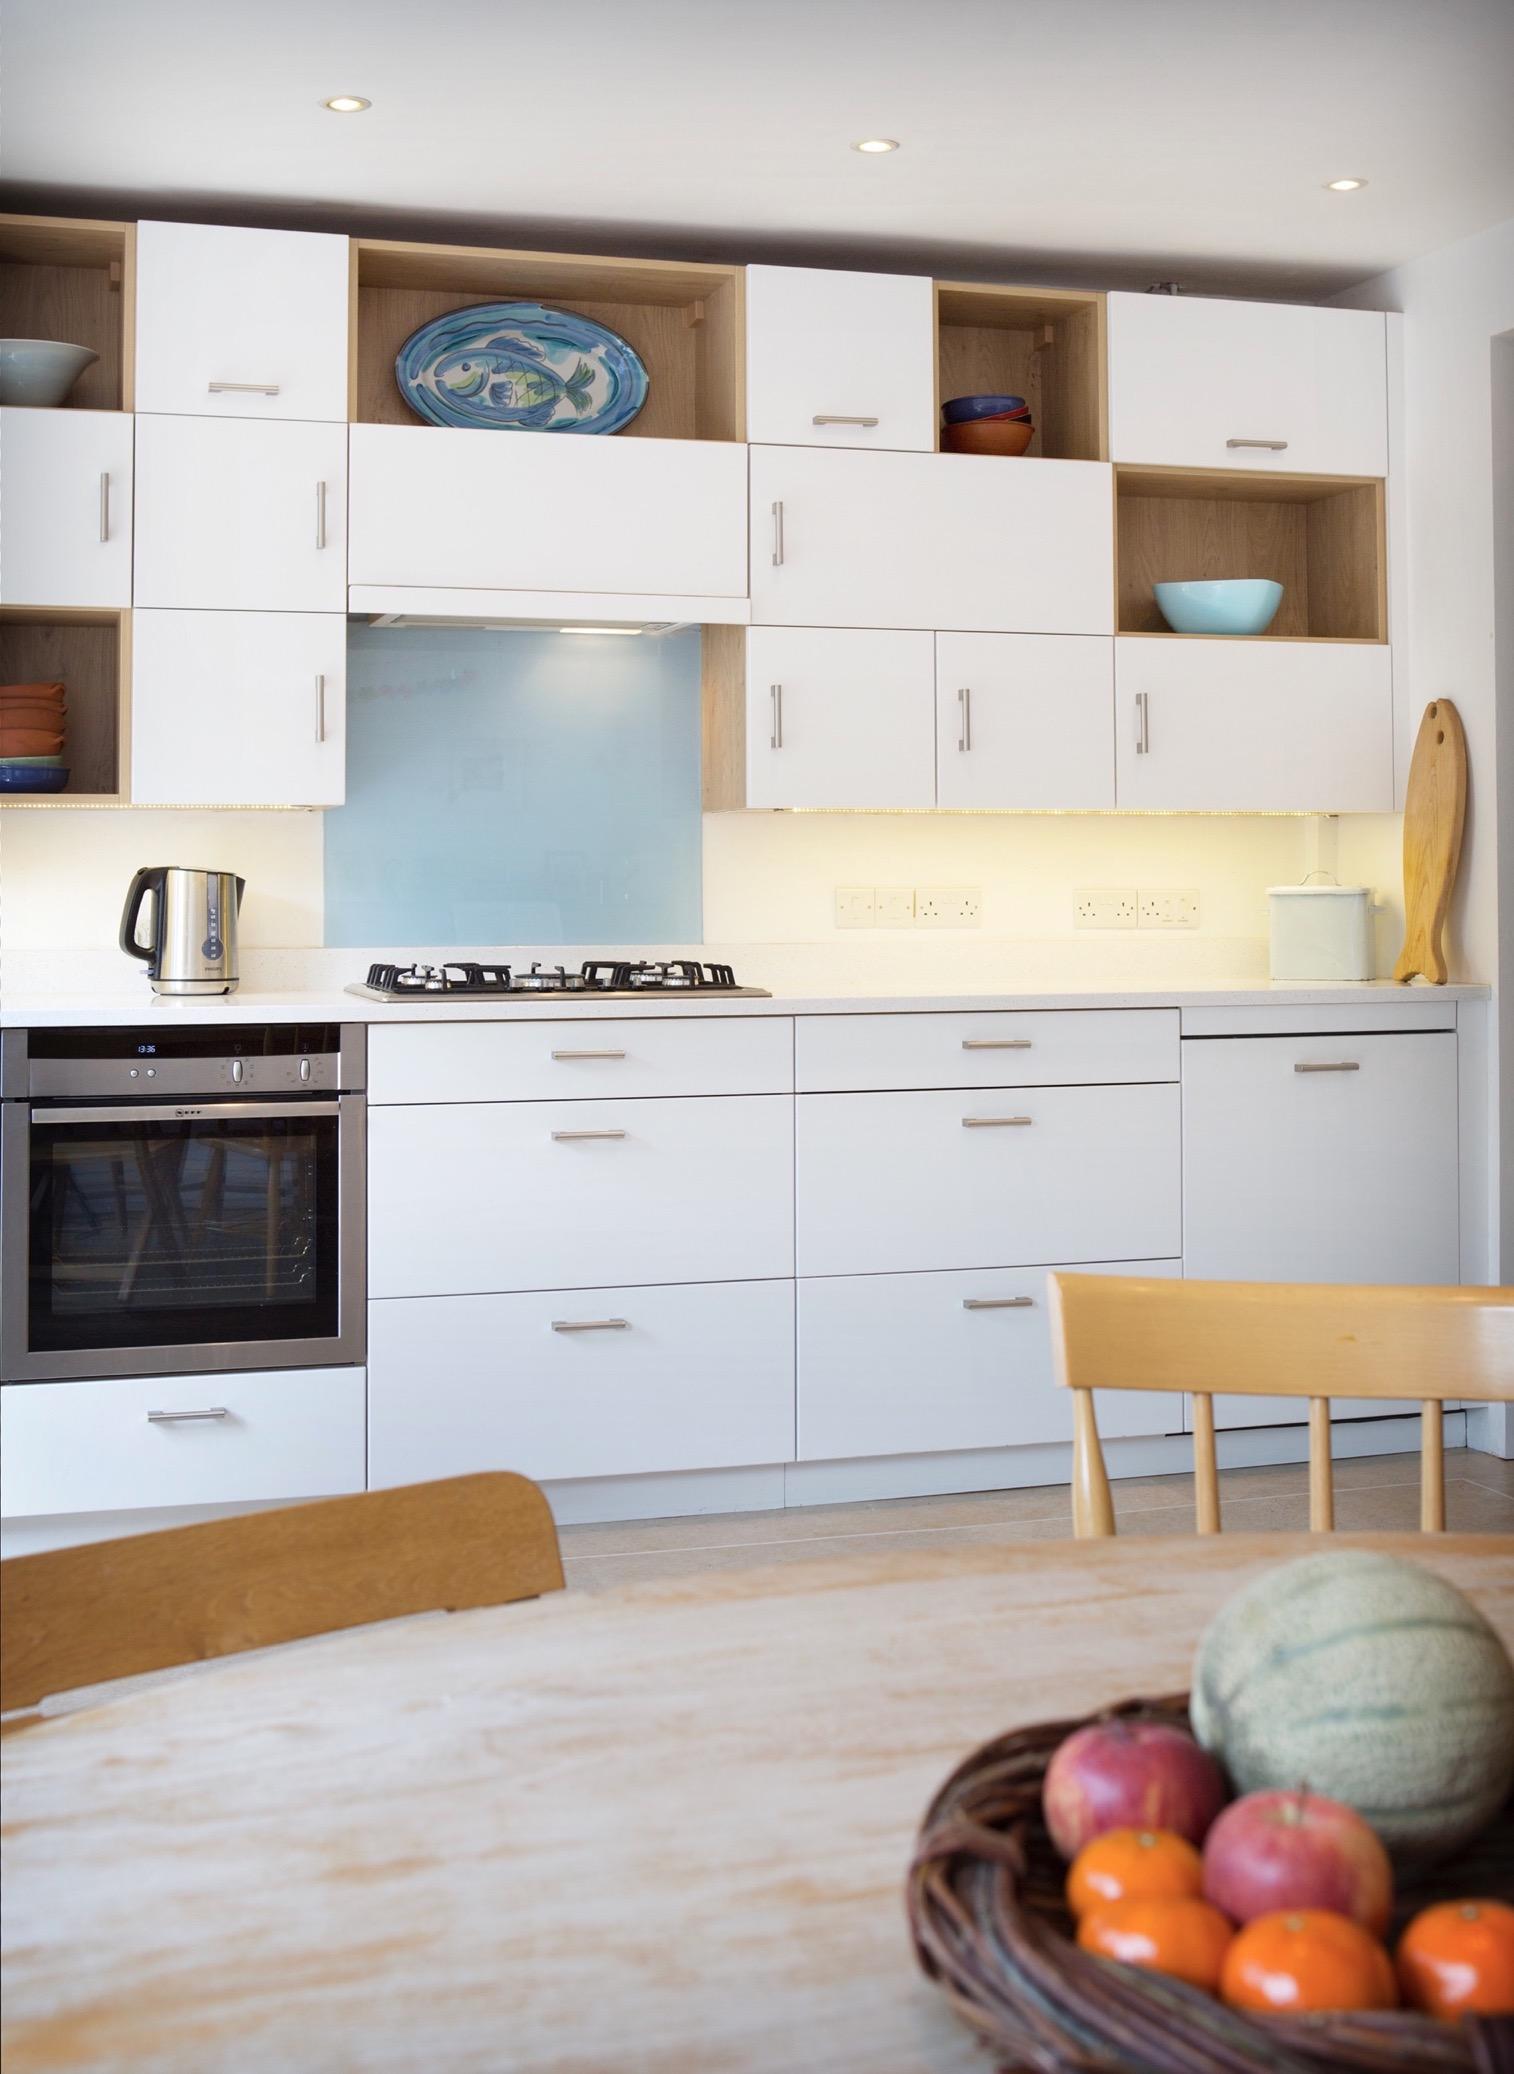 Oxford modular kitchen glass backsplash 1